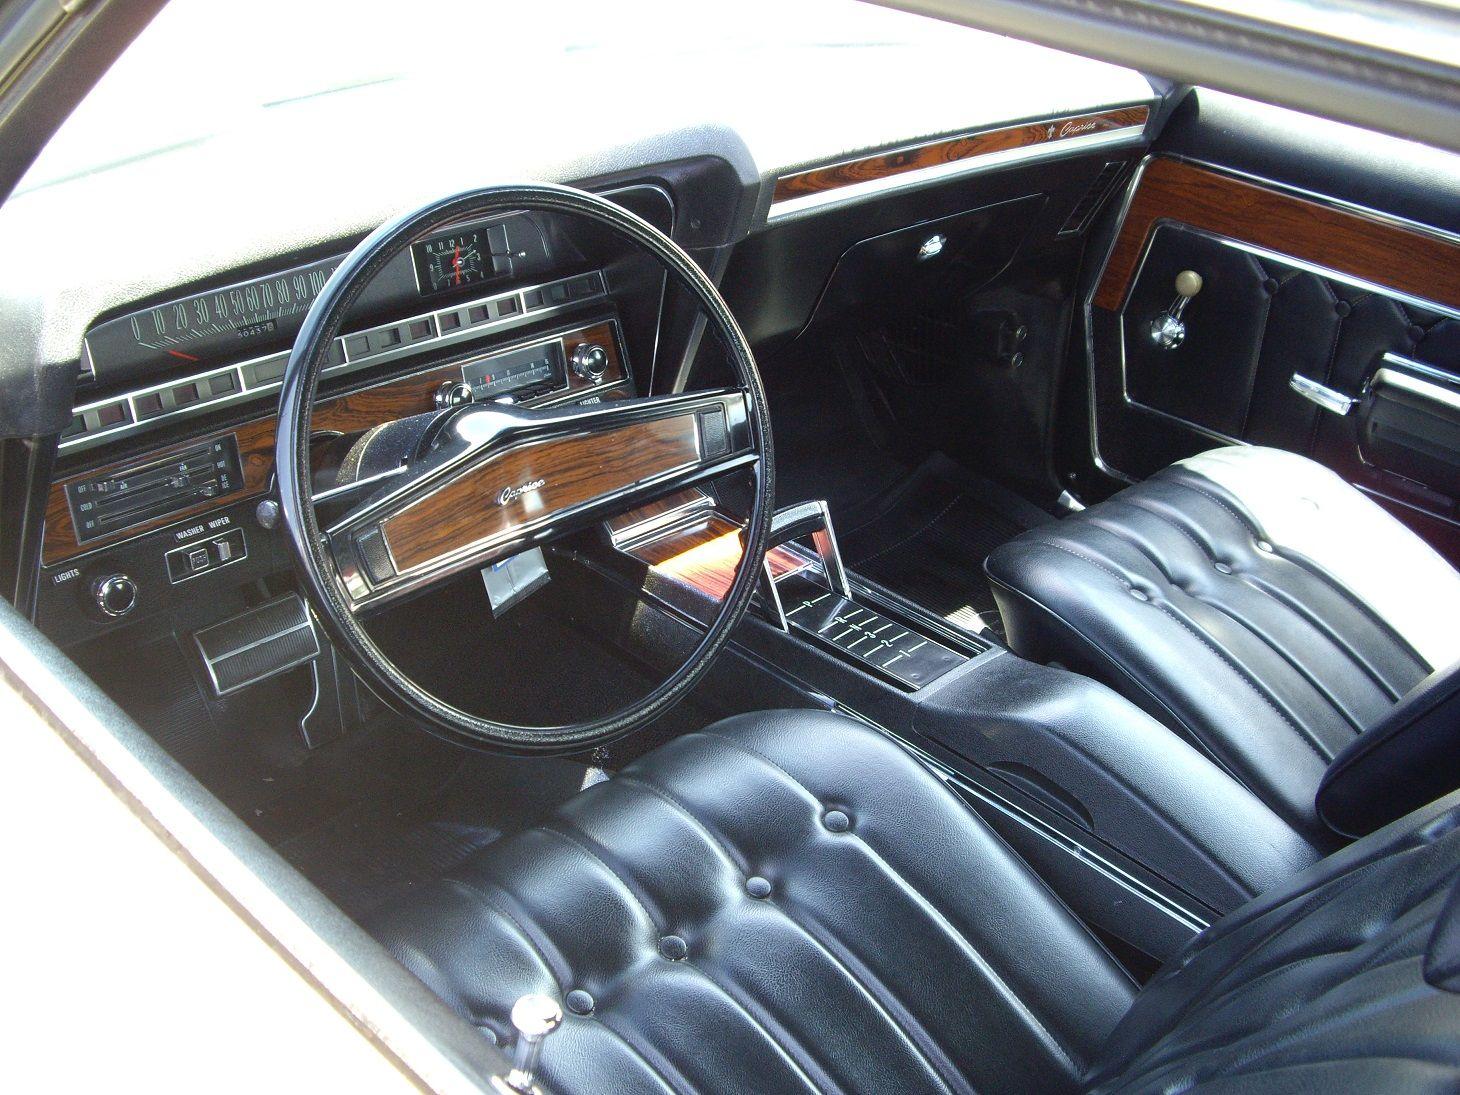 1969 Chevrolet Caprice Interior With Strato Bucket Seats